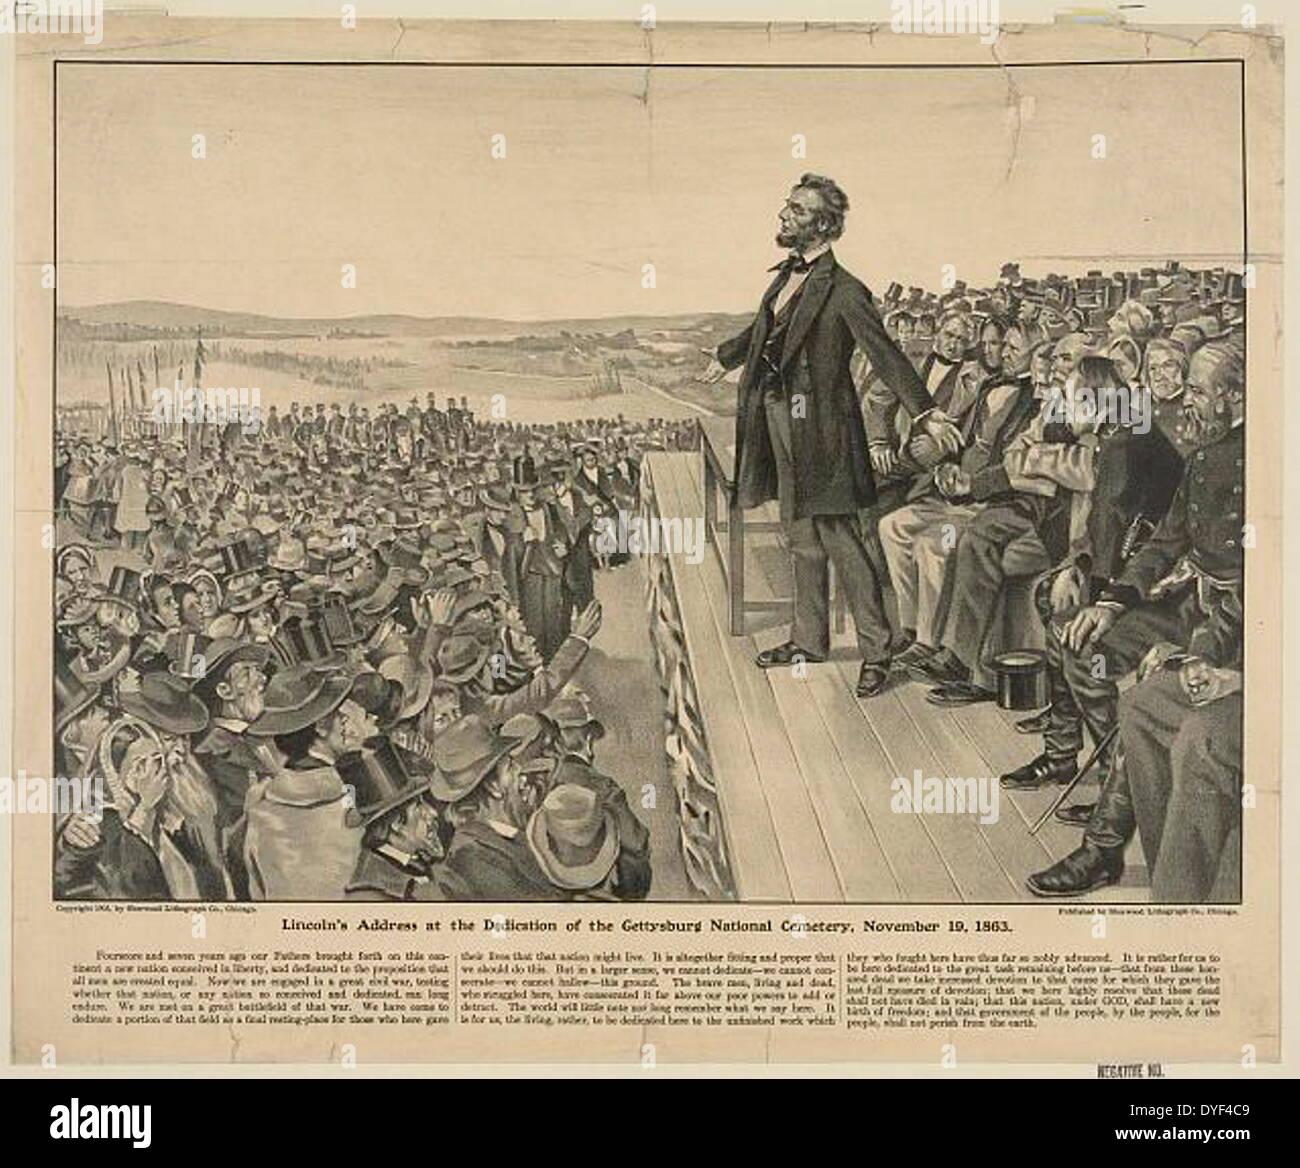 The Gettysburg Address 1863. President Abraham Lincoln delivering the Gettysburg Address. Stock Photo